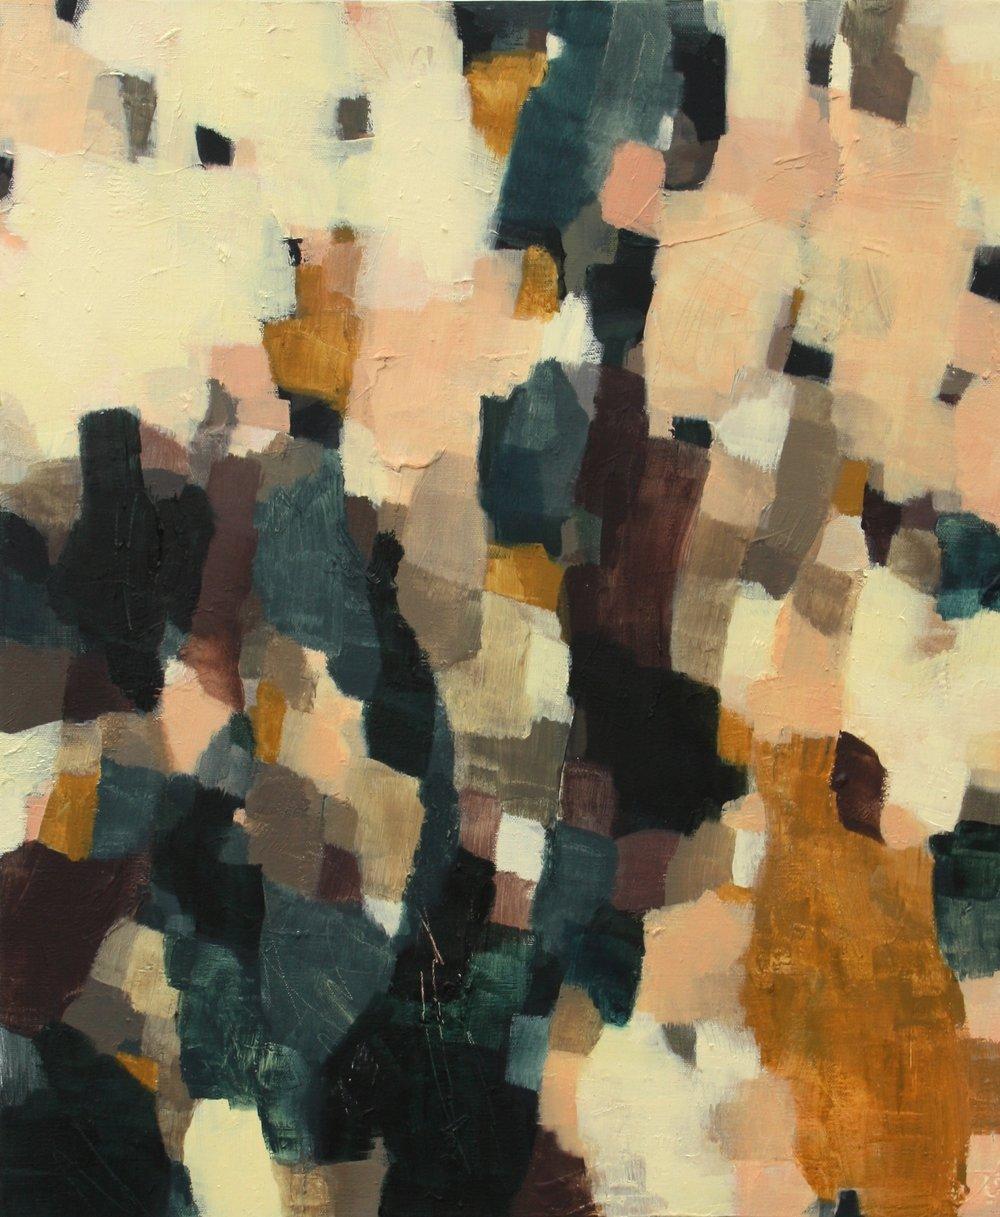 Introspection #1  2015 Oil on canvas, 61 x 51cm